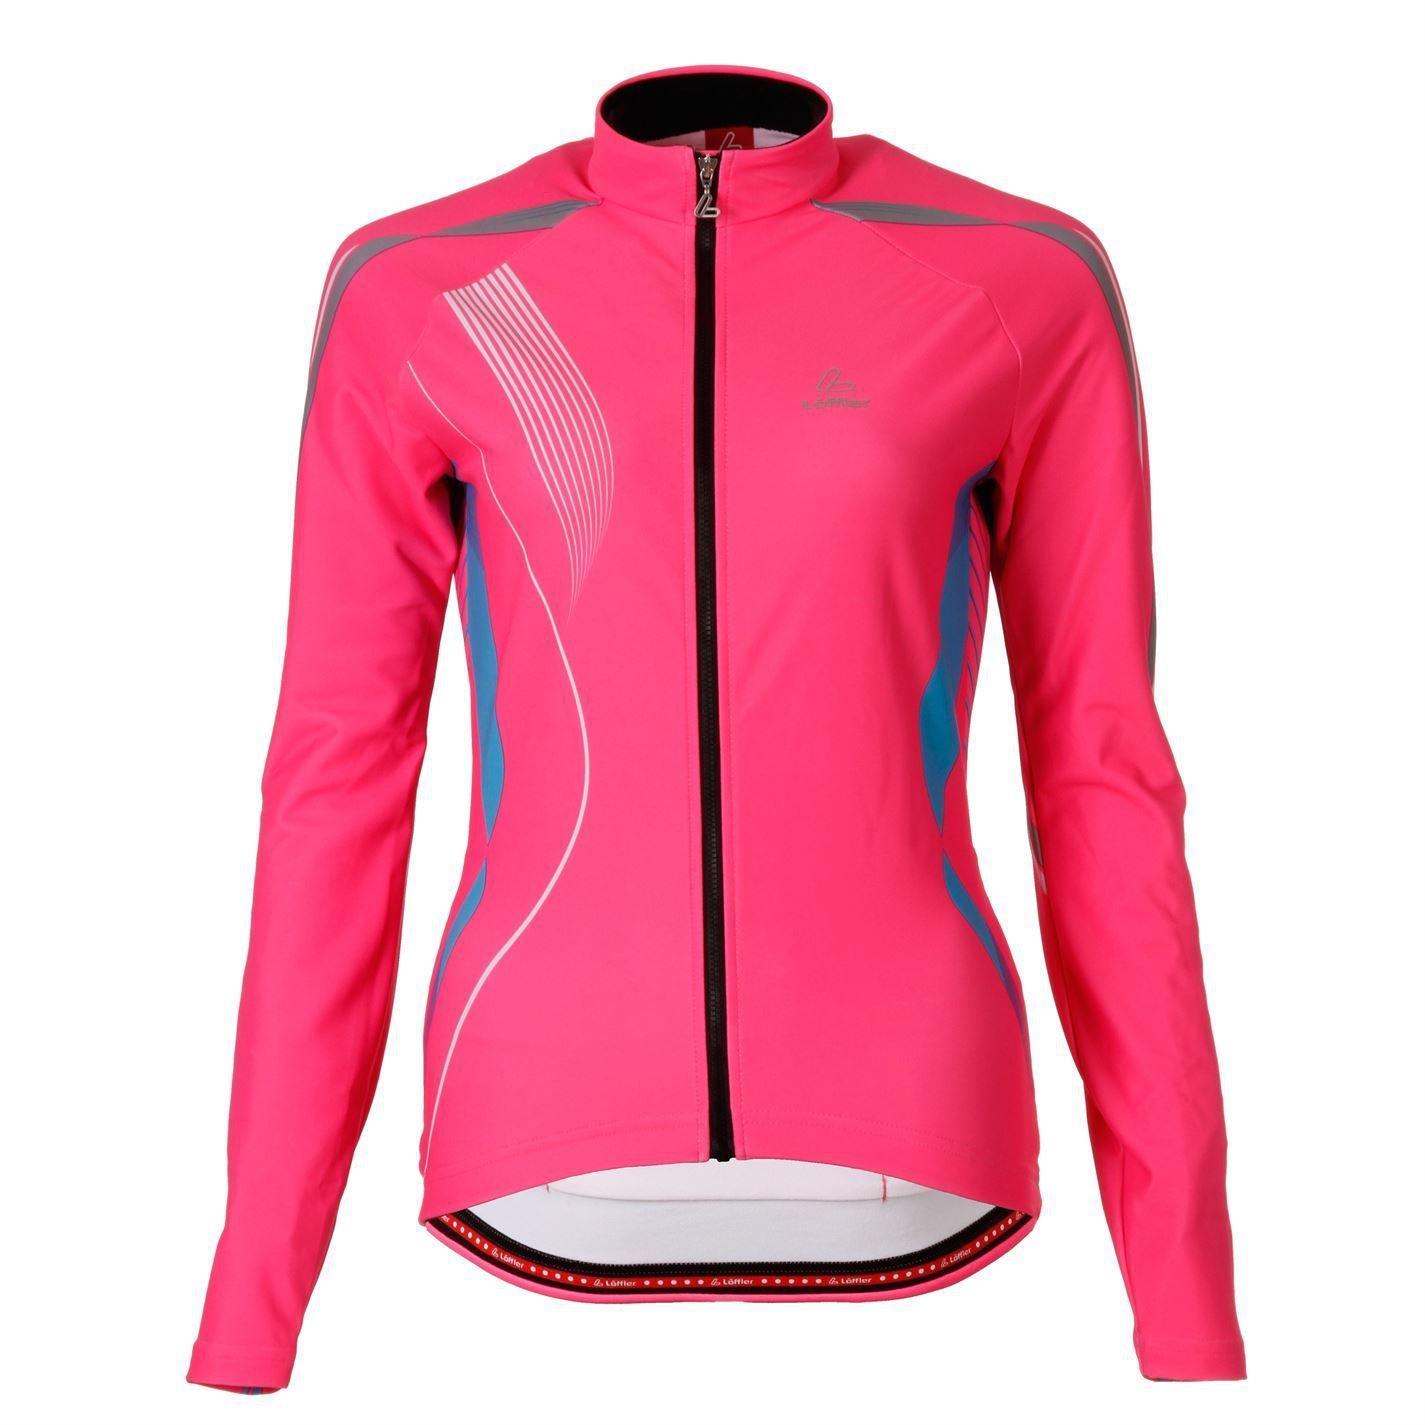 Löffler Womens FZ Jersey Ladies Long Sleeve Cycle Cycling Sports Shirt Top